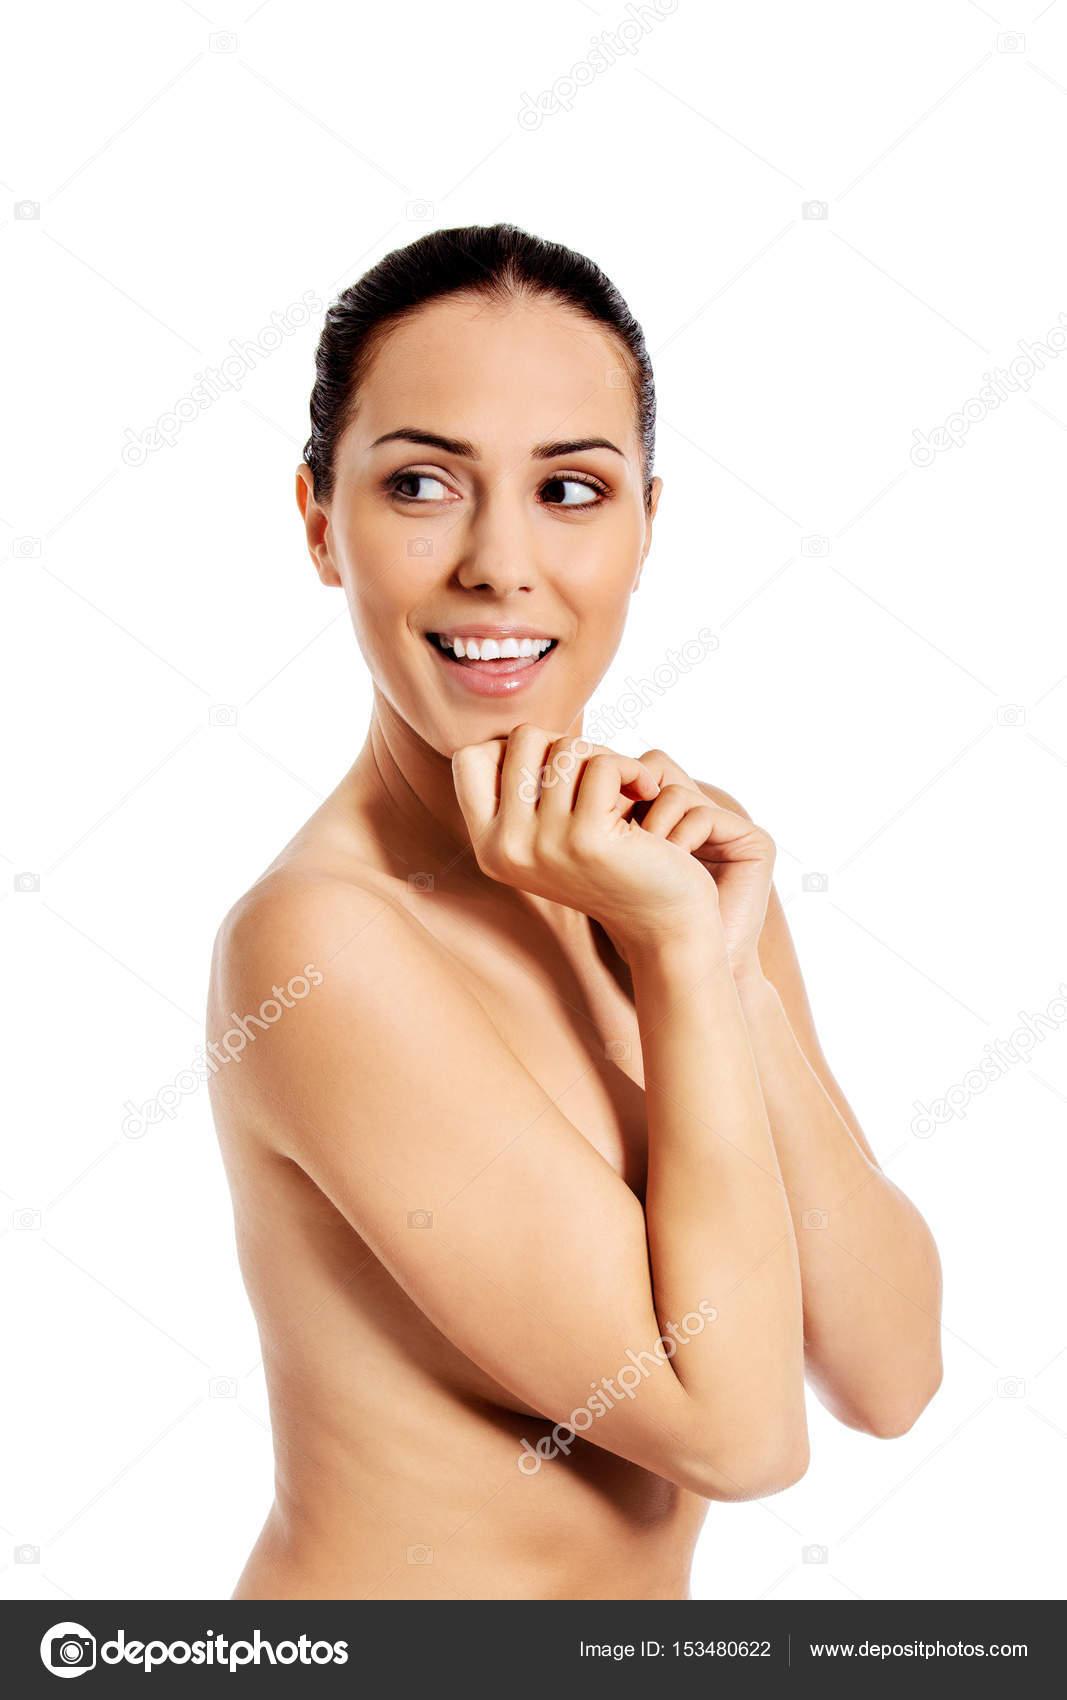 Mulheres nua corpo perfeito remarkable